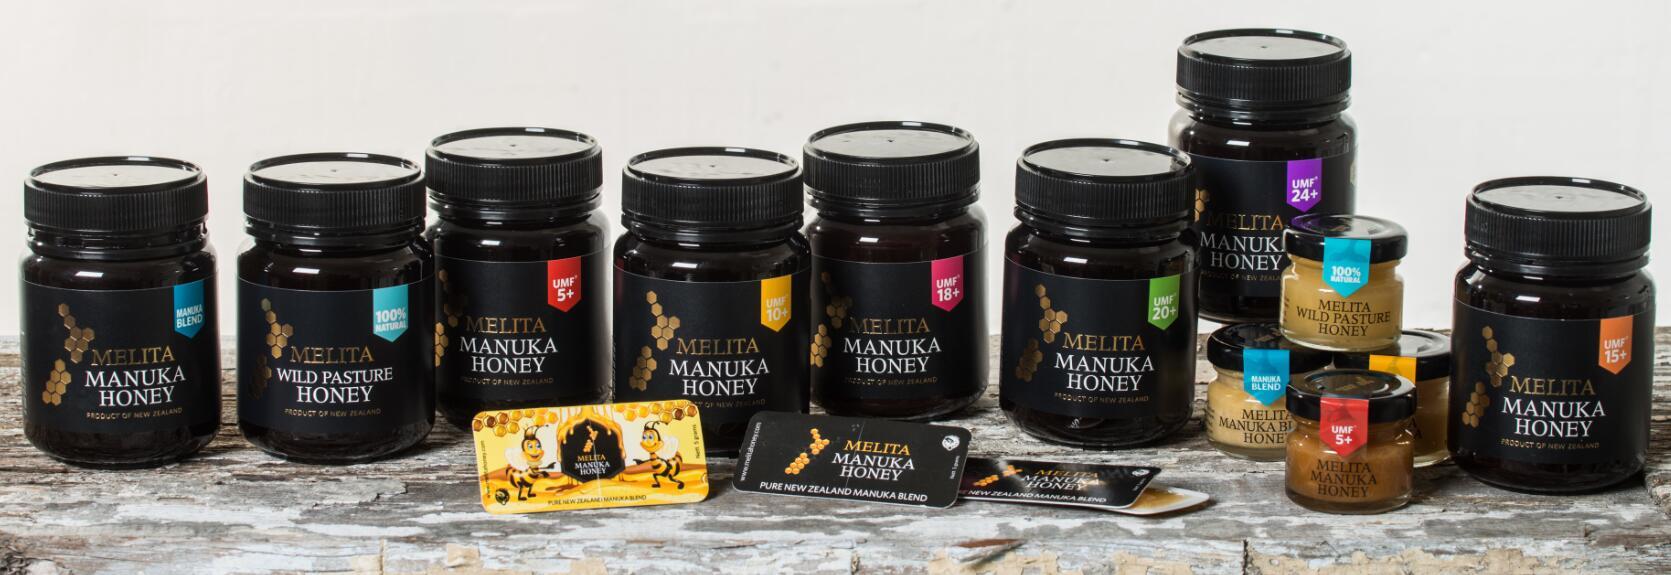 Melita蜂蜜在内的50多种蜂蜜